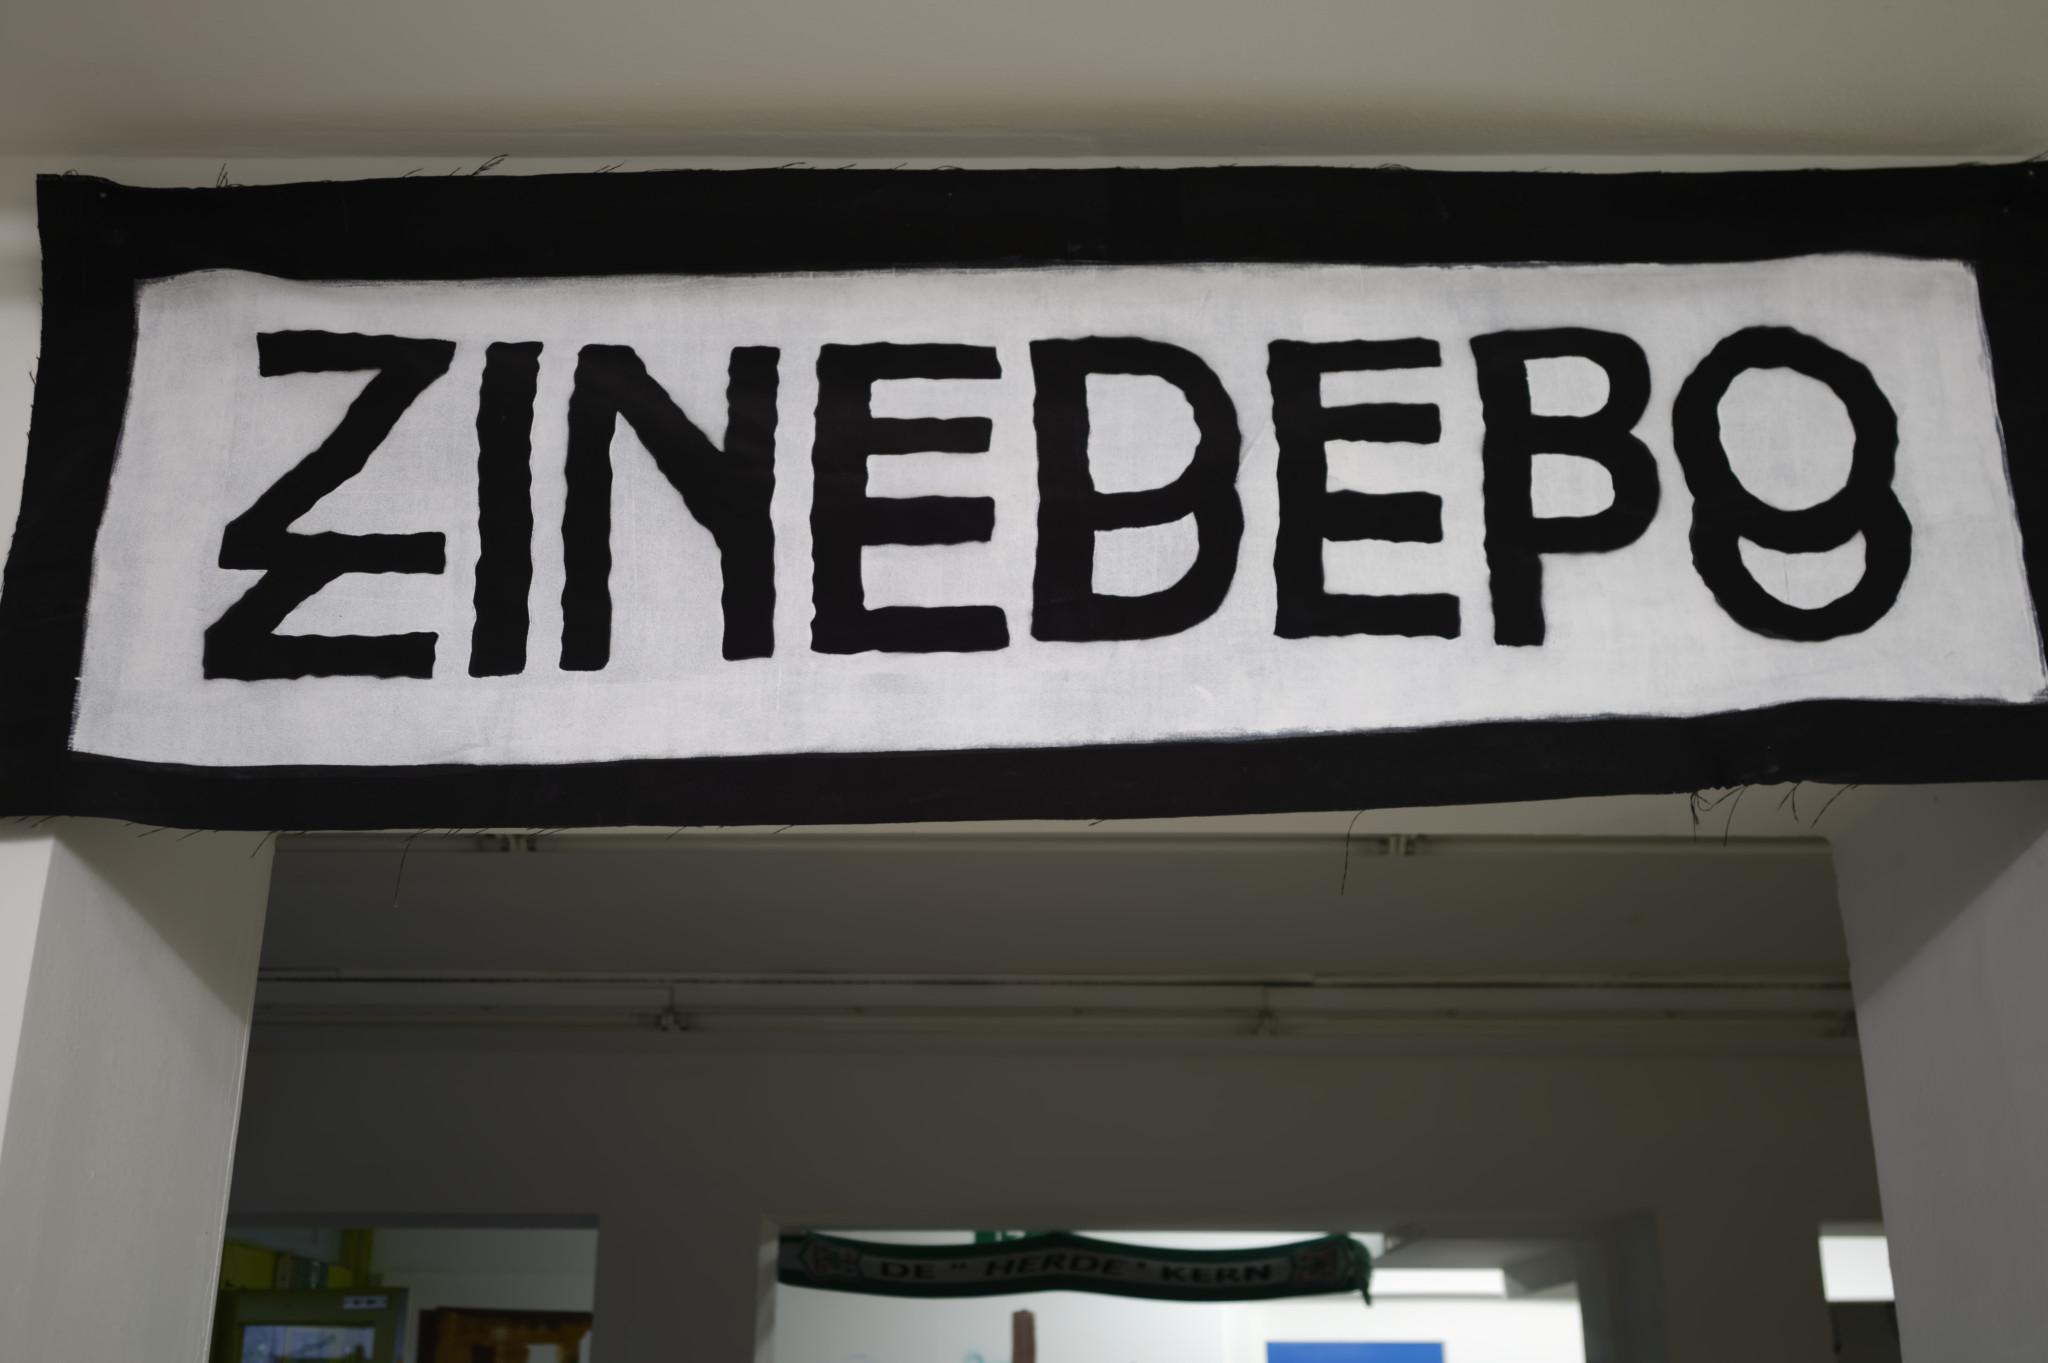 Zinedepo